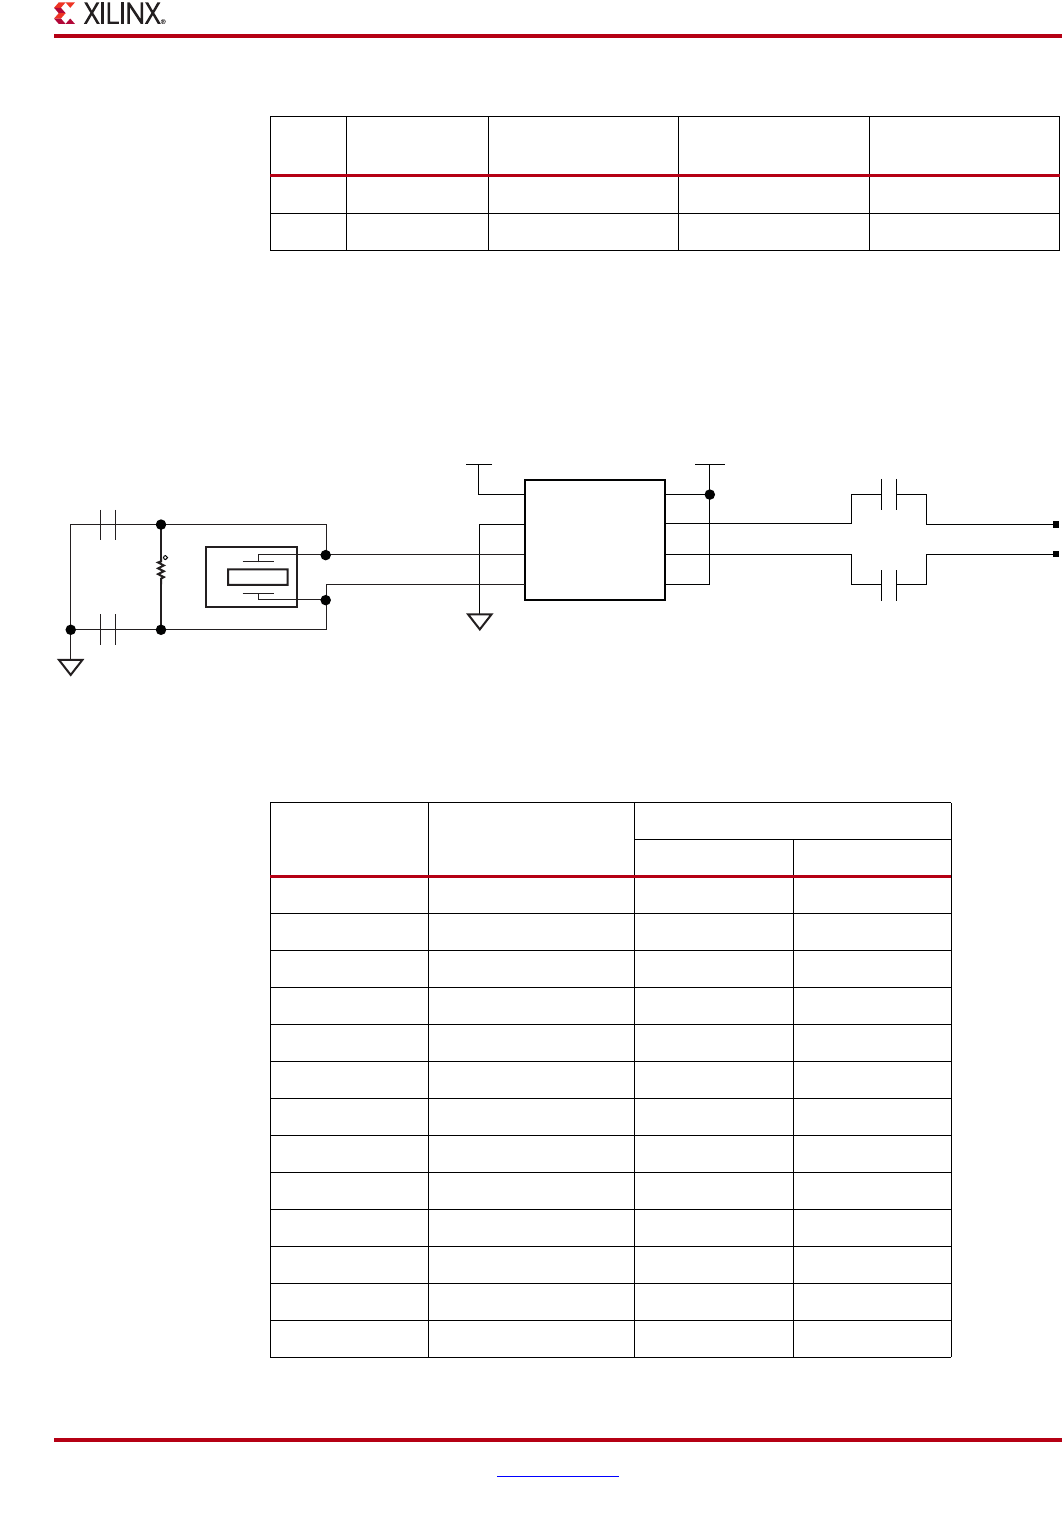 Xilinx Ml605 Sgmii Gtx Transceiver Clock Generation Virtex 6 Block Diagram